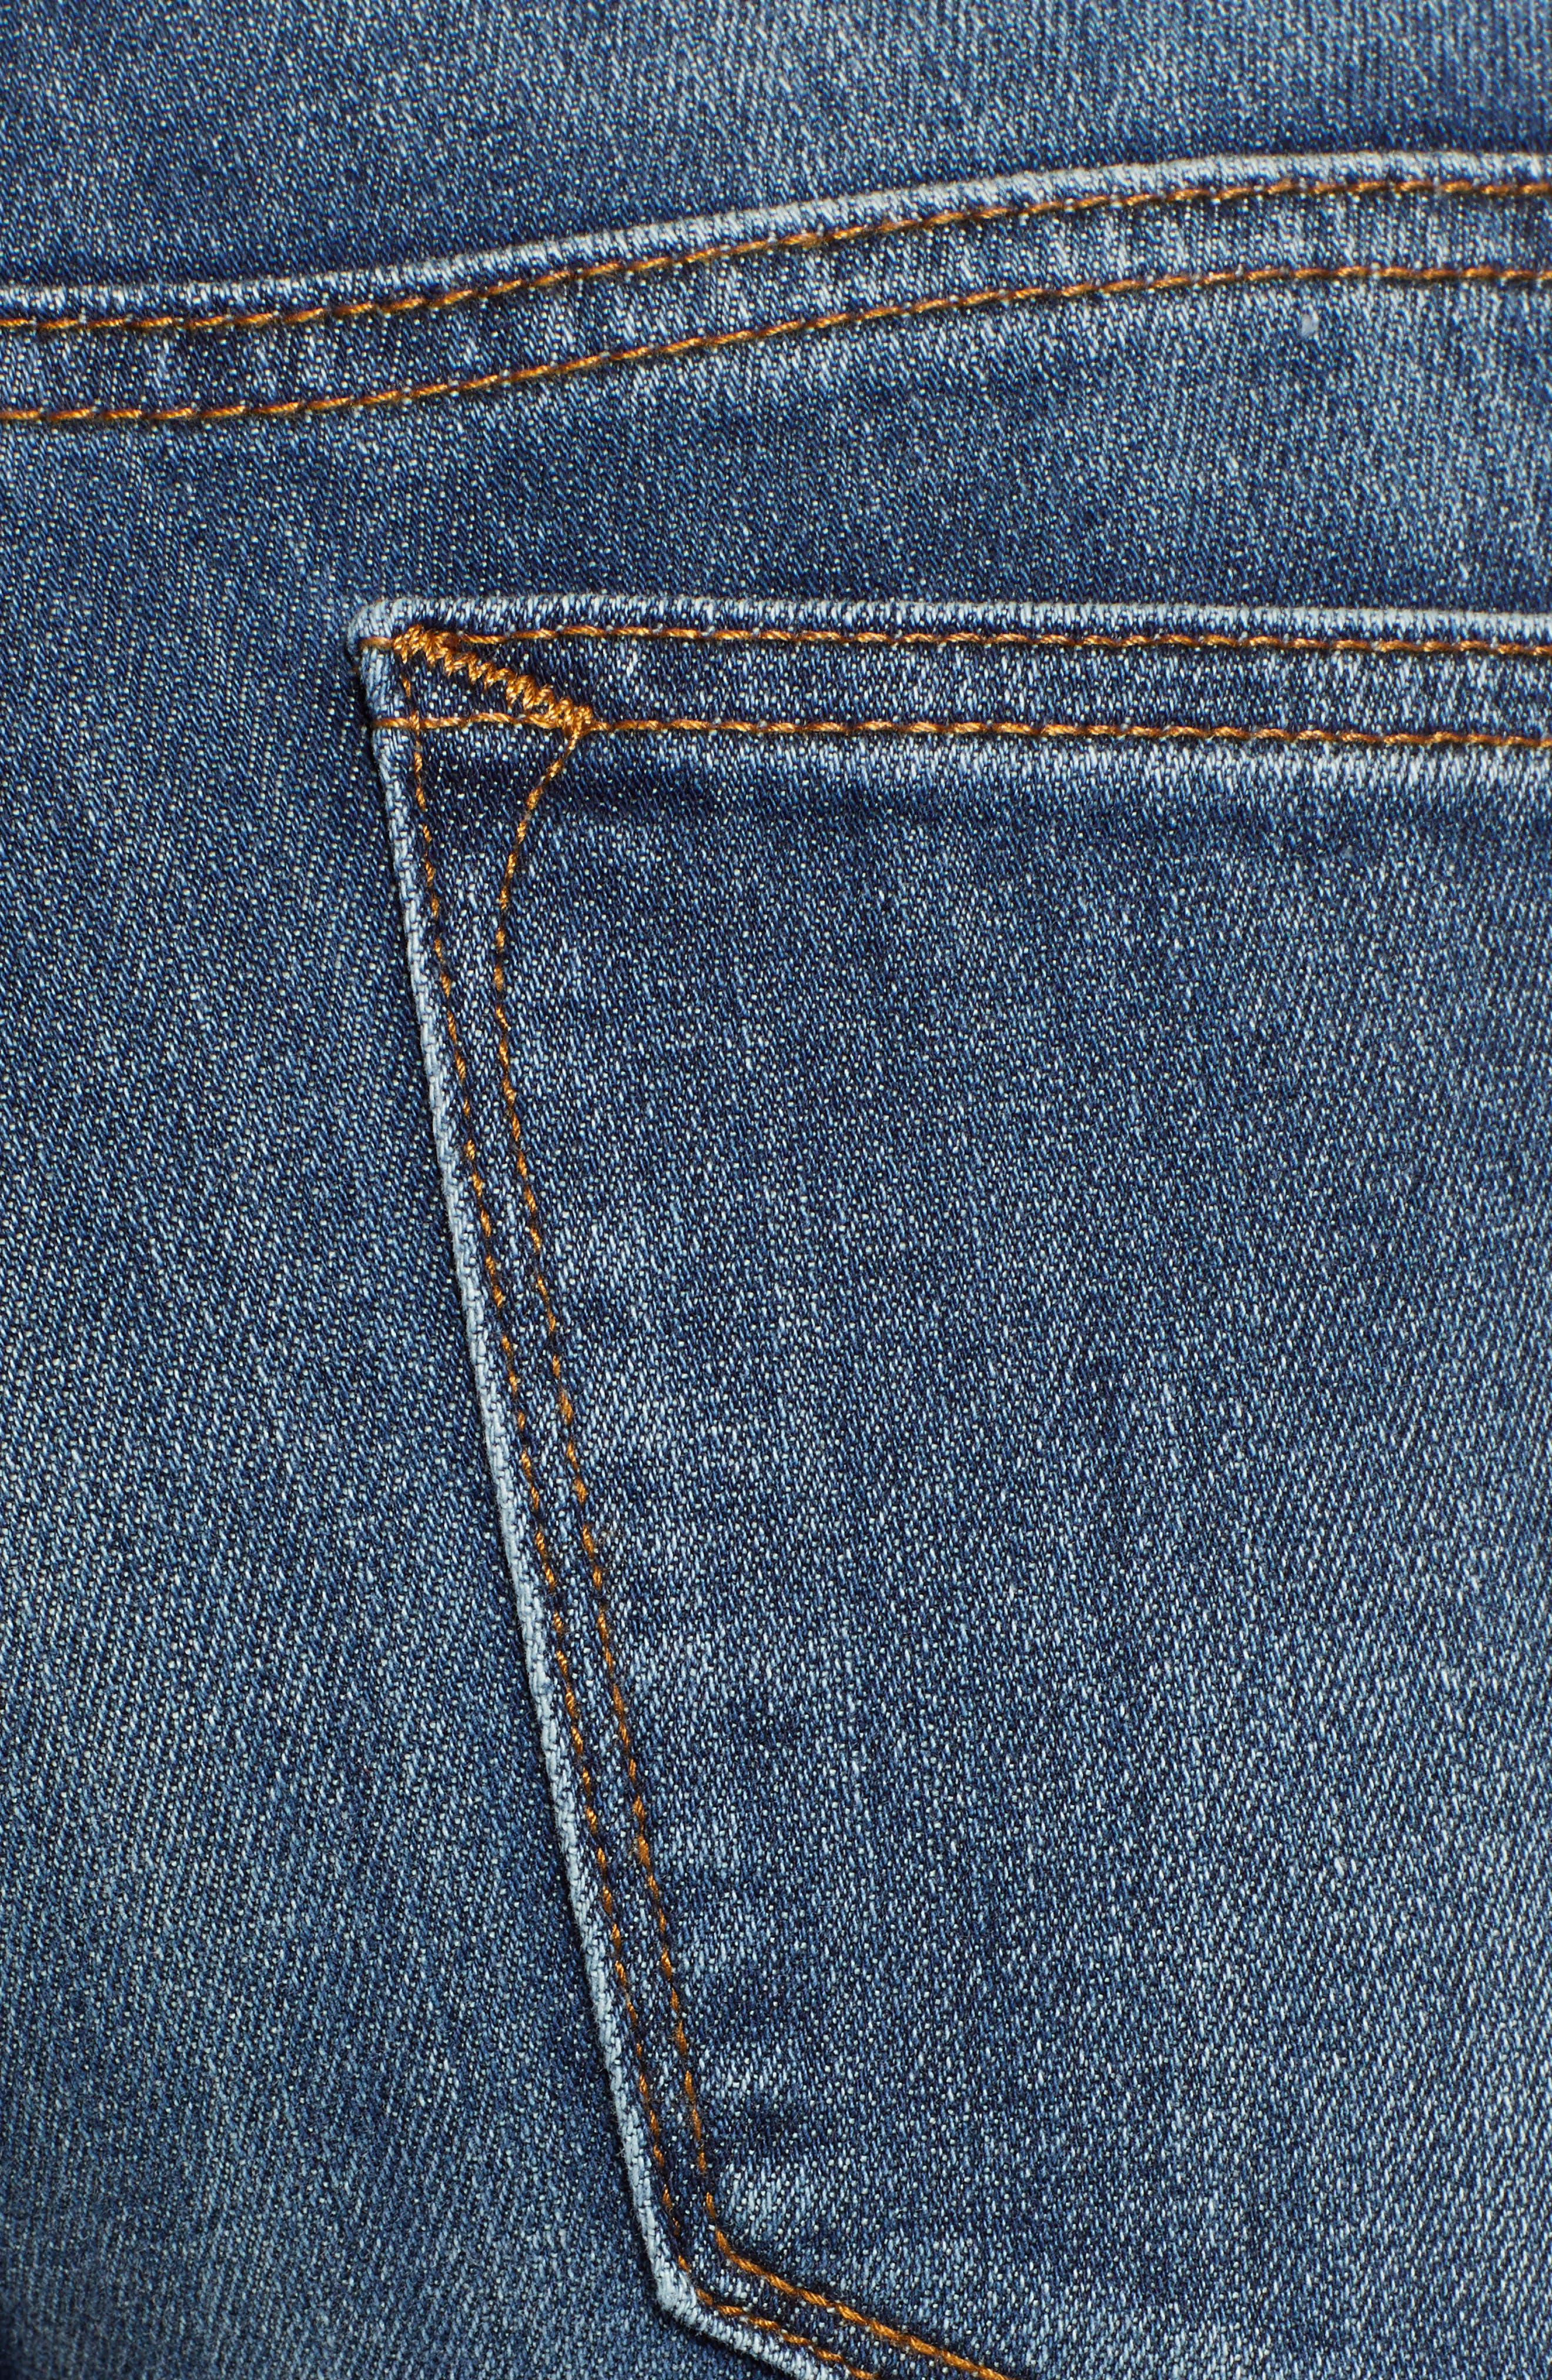 Jagger High Waist Bootcut Jeans,                             Alternate thumbnail 6, color,                             DARK WASH